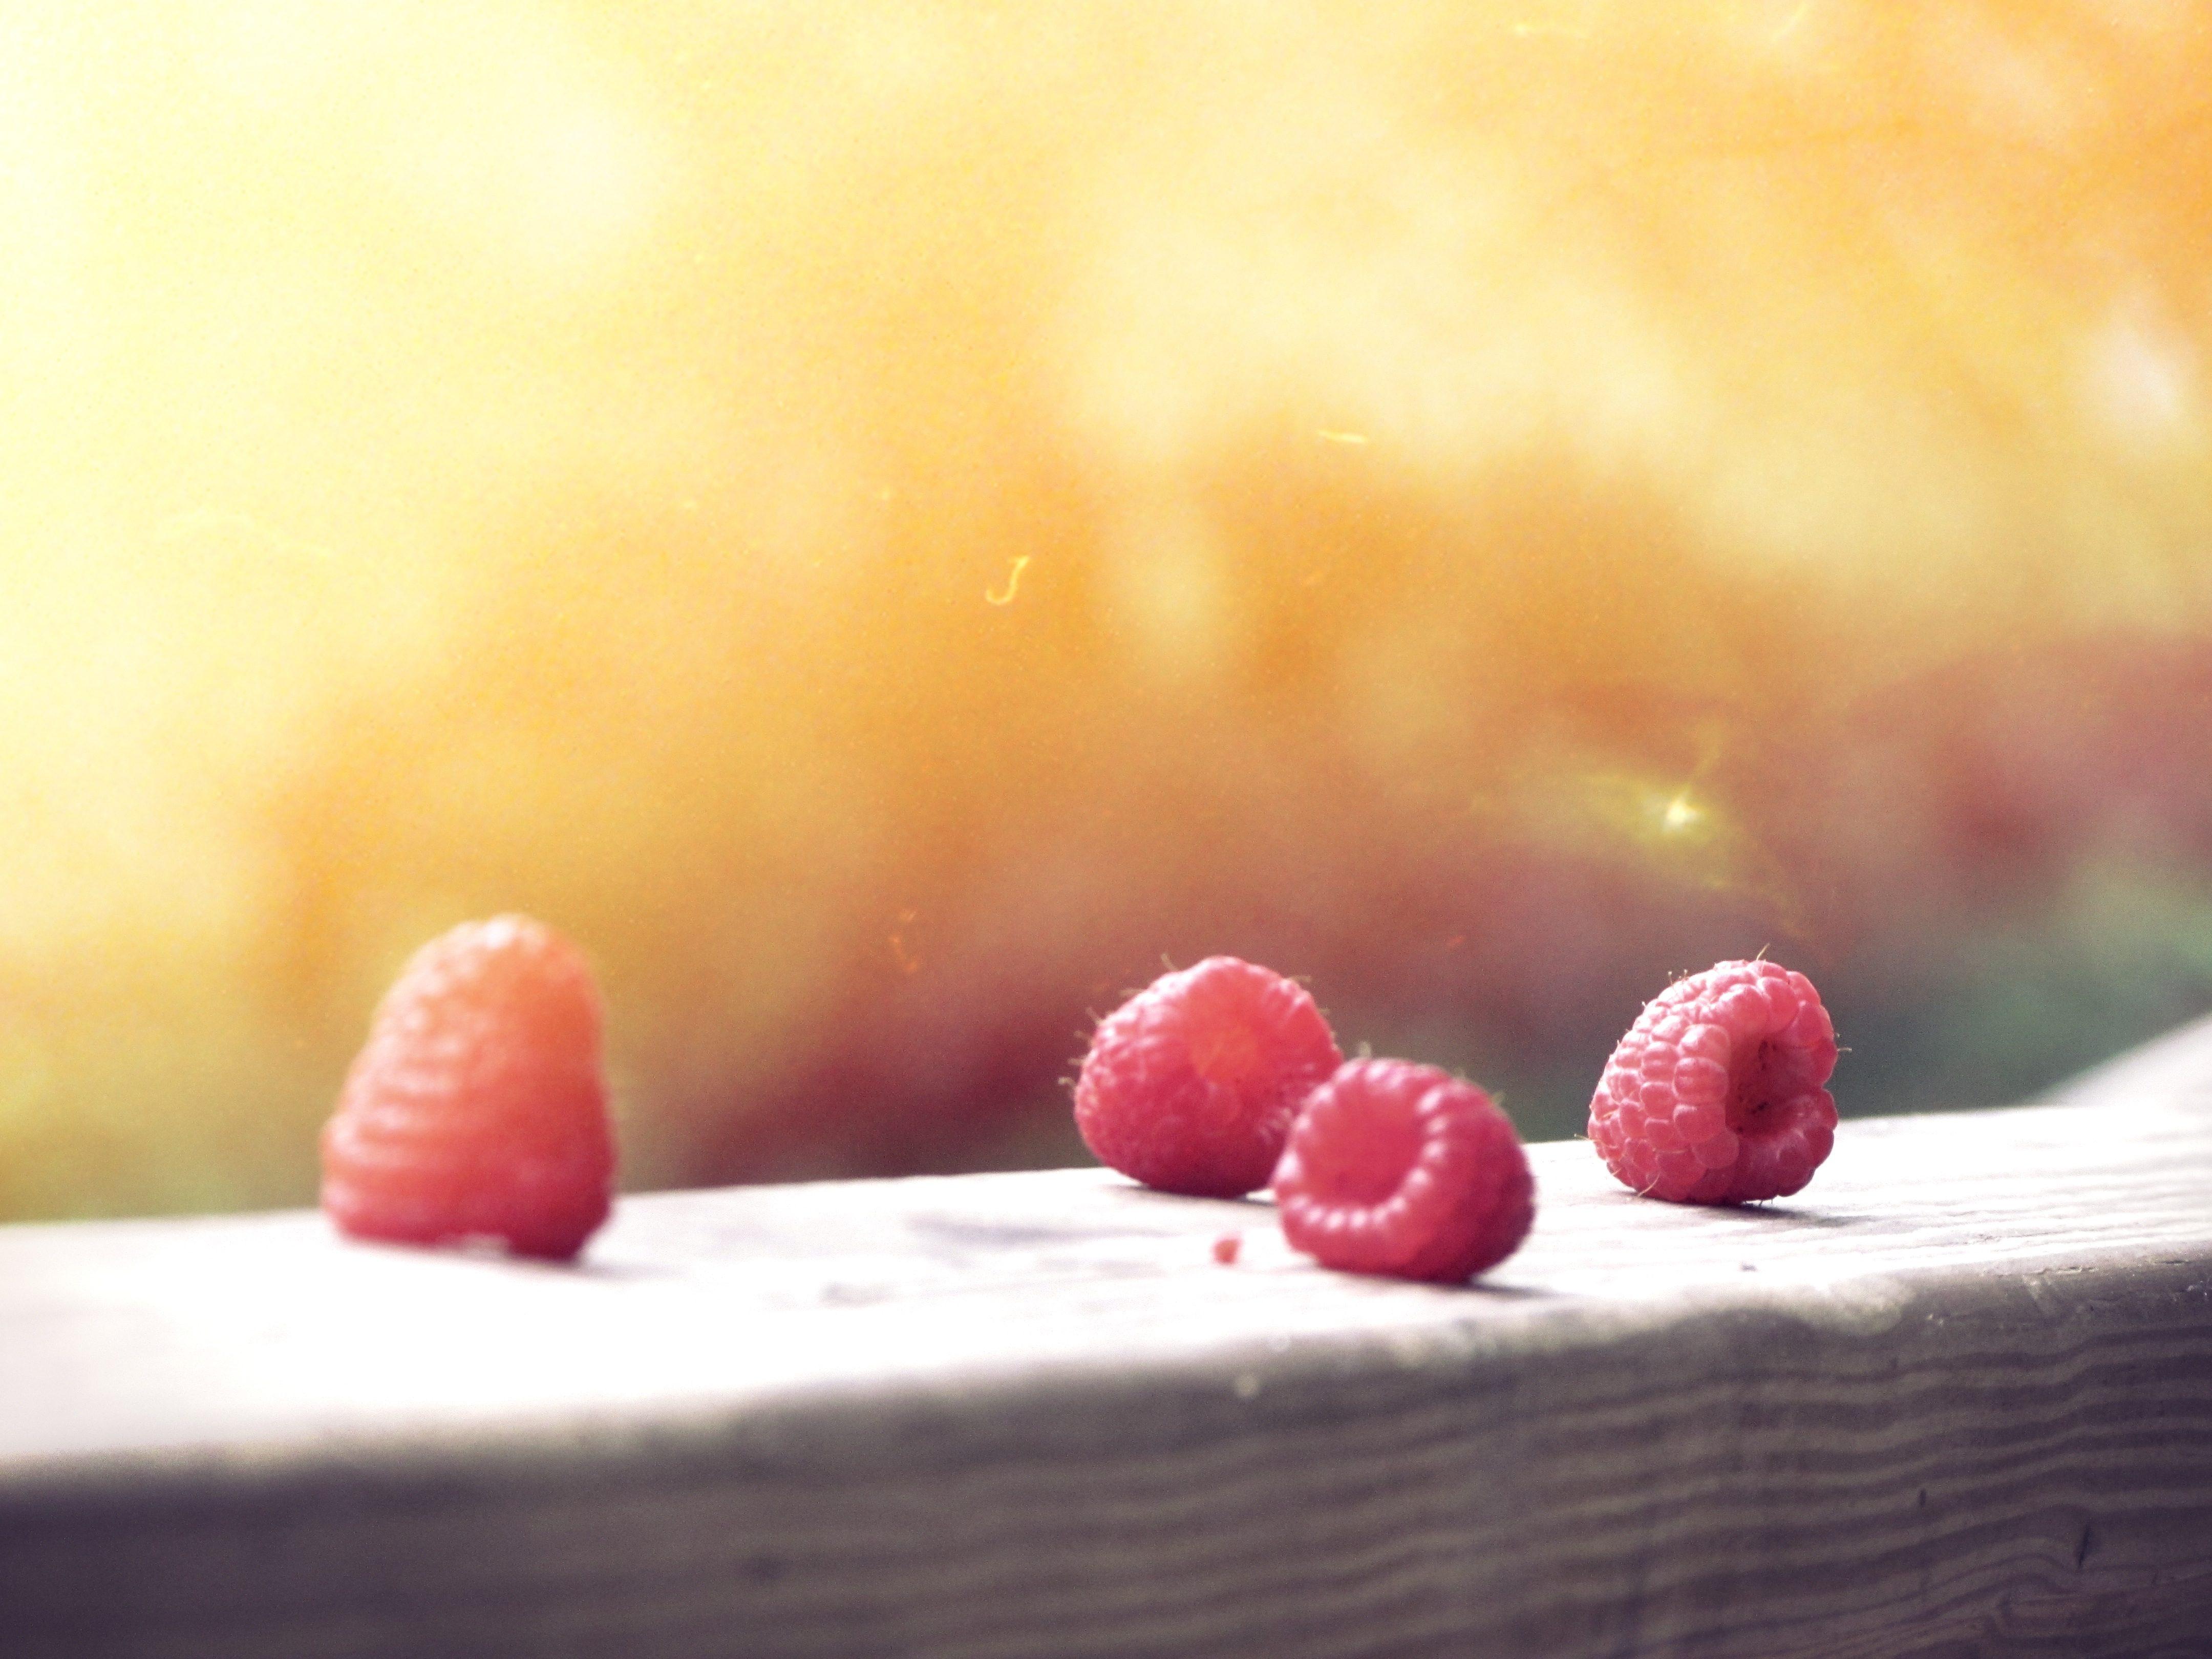 arándanos, madera, fruta, sol, luminosidad - Fondos de Pantalla HD - professor-falken.com